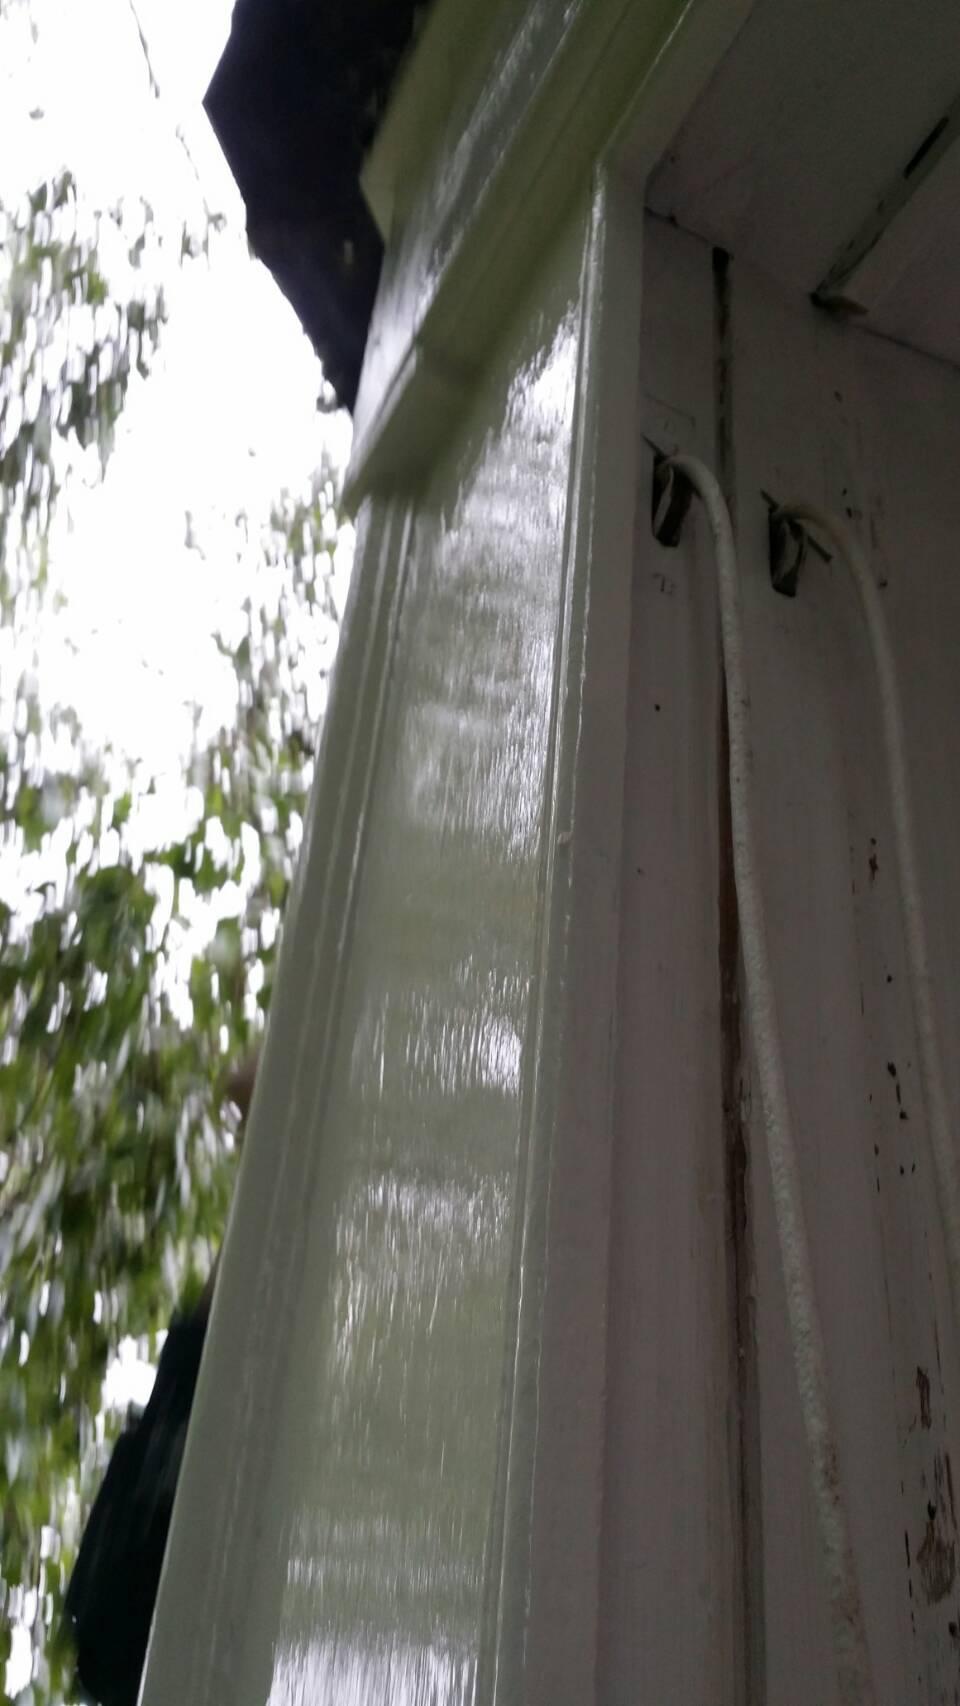 glossed sash window frame